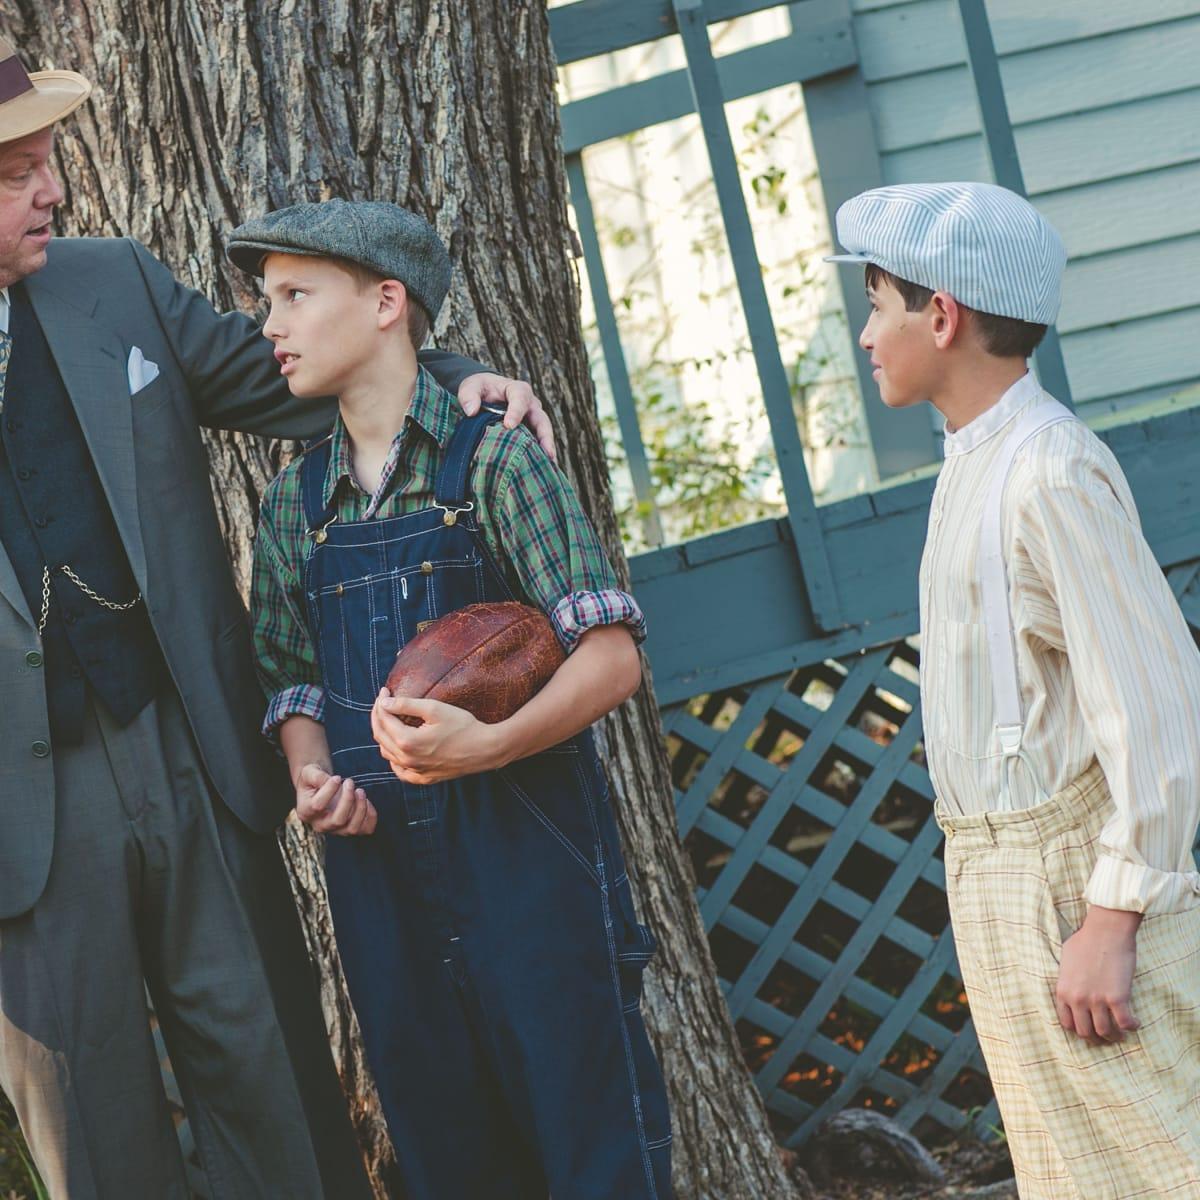 Theatre Arlington presents To Kill a Mockingbird